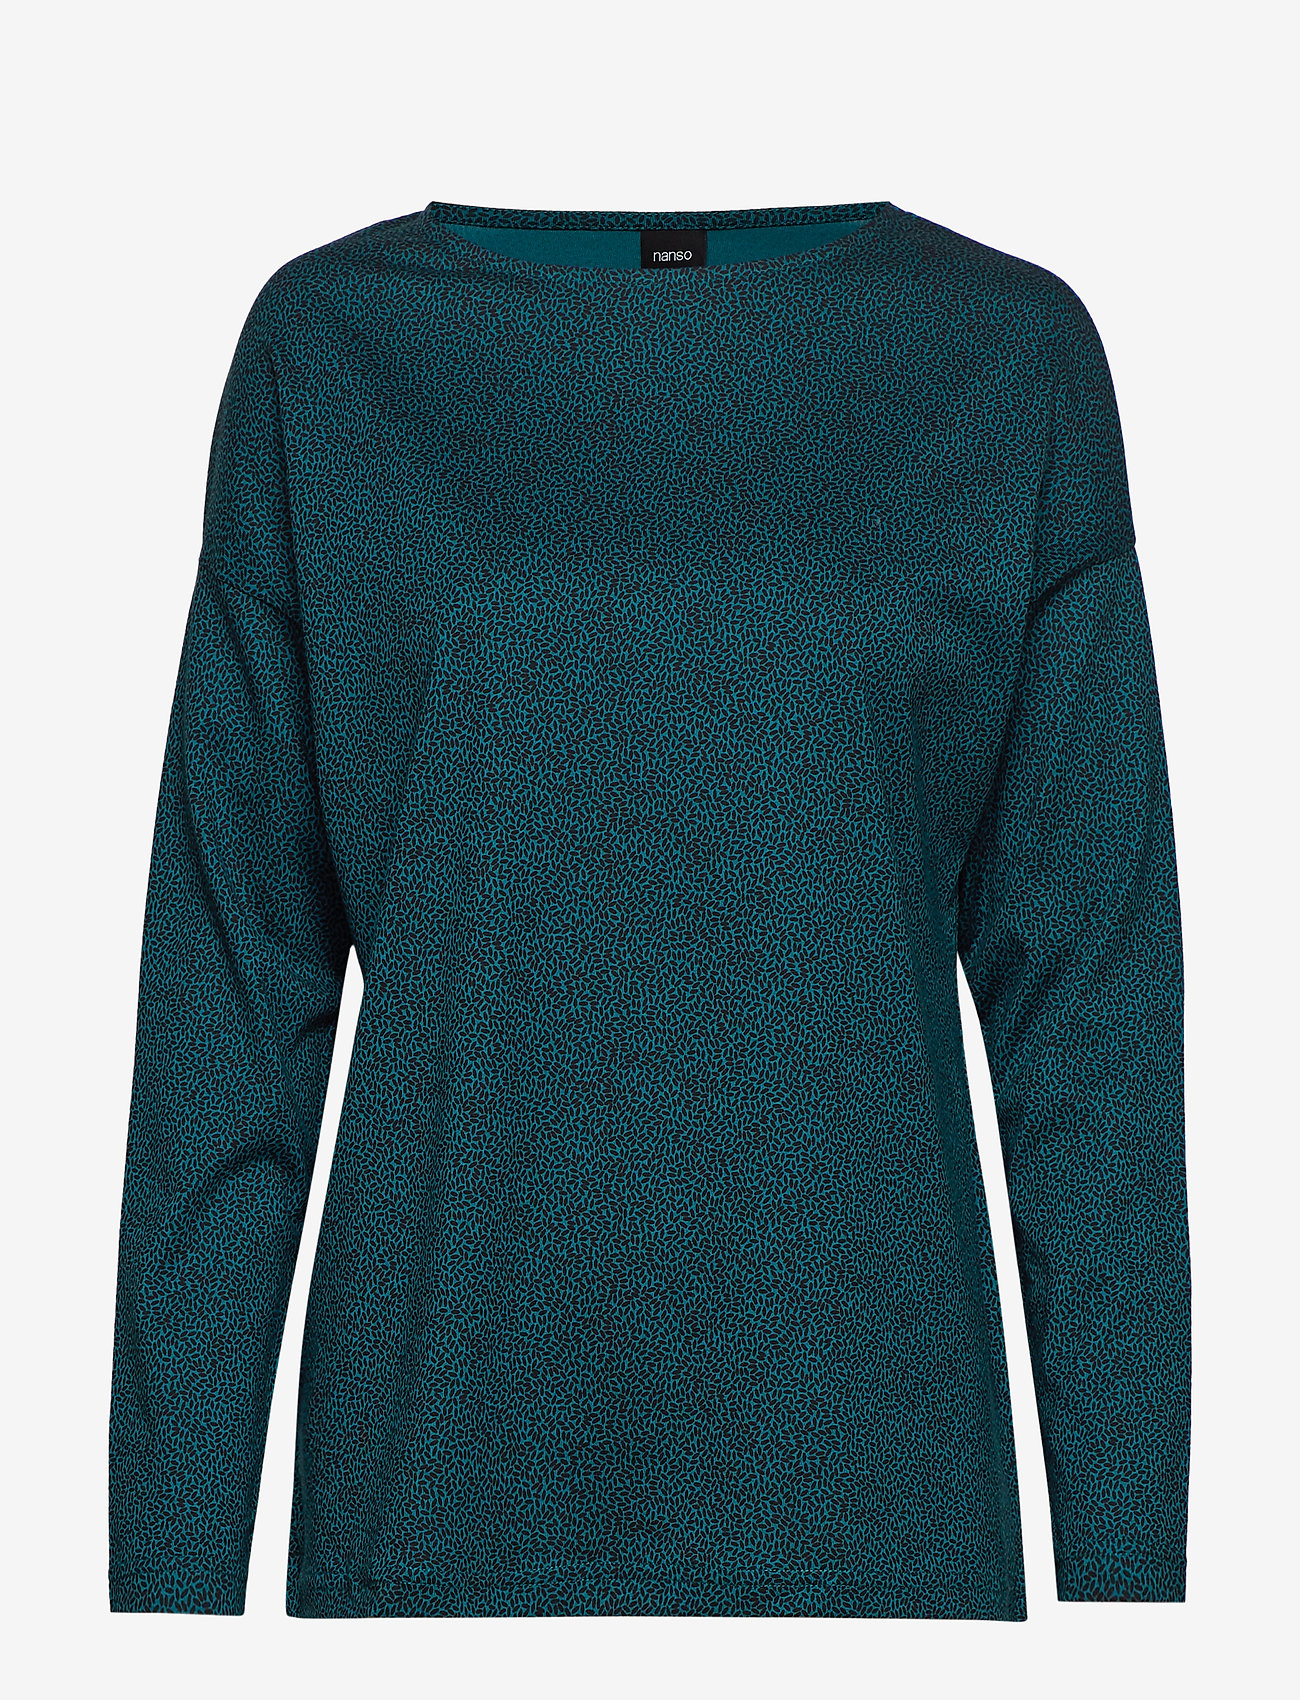 Nanso - Ladies blouse, Riisi - swetry - petrol - 0